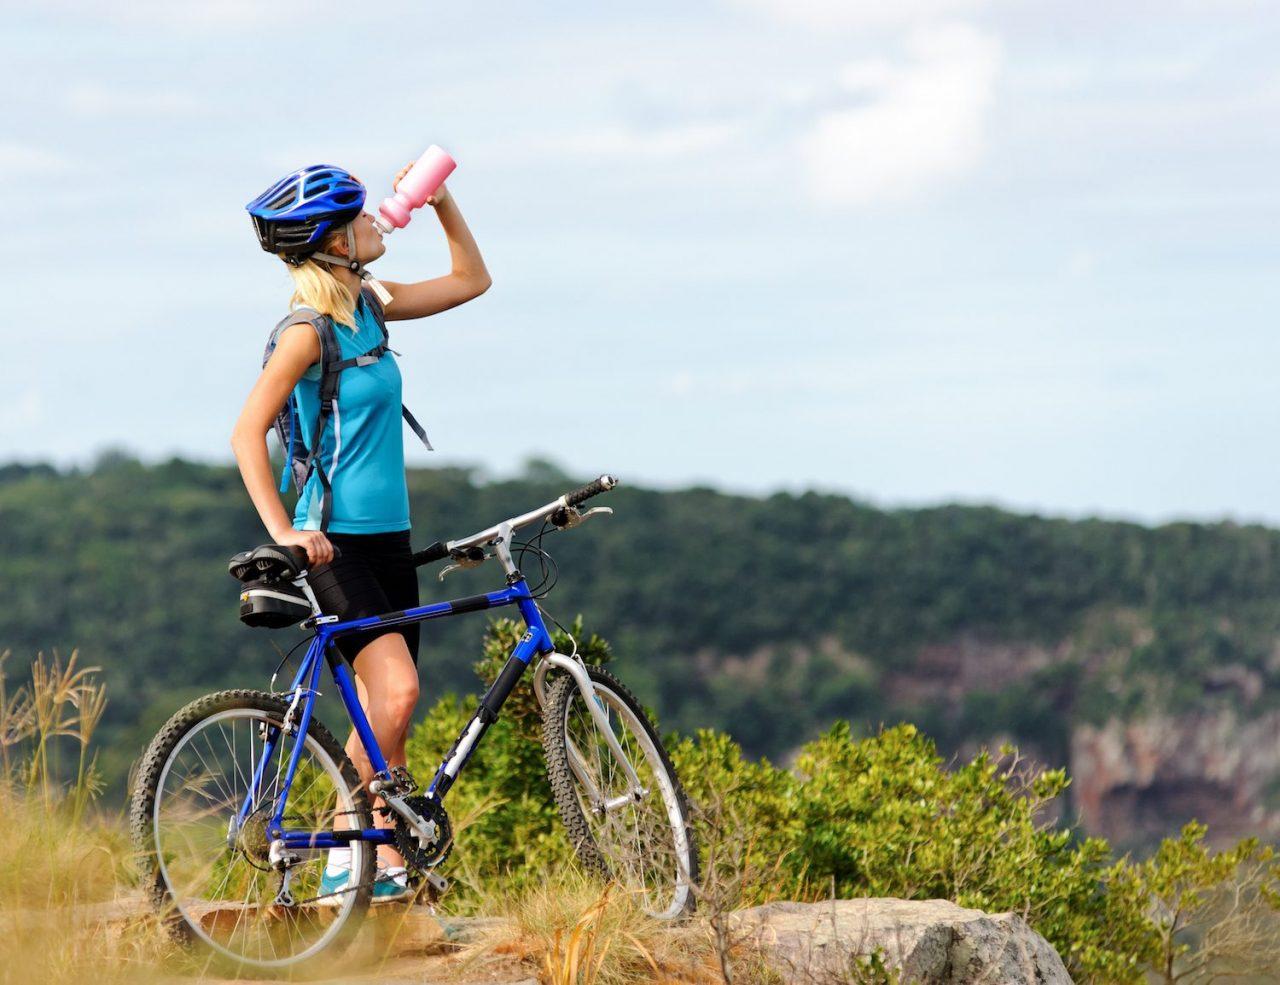 The Best National Parks for Biking